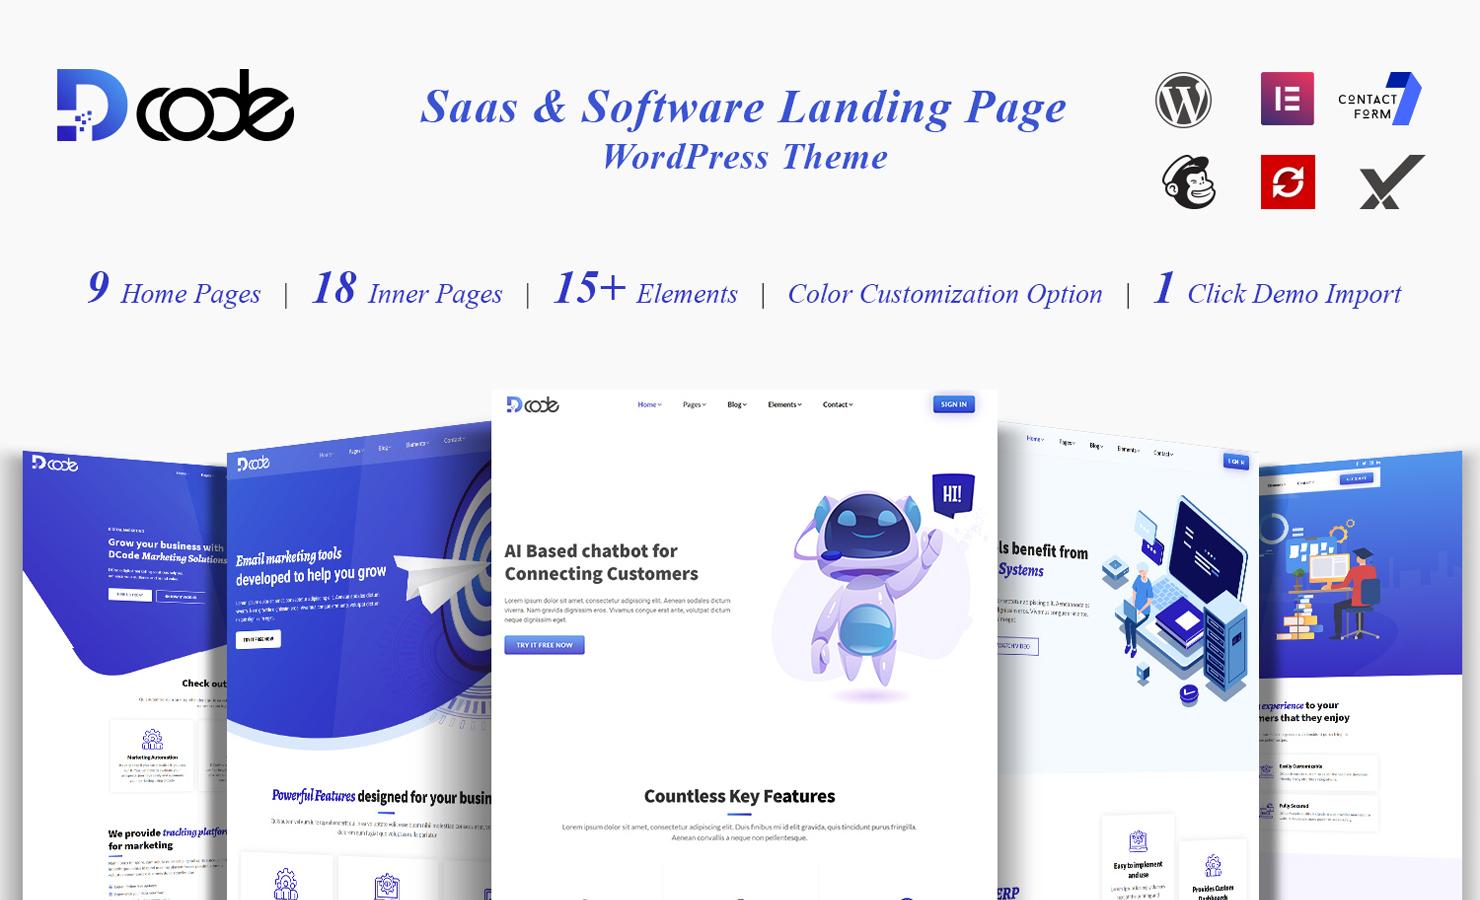 DCode SaaS and Software Landing Page WordPress Theme